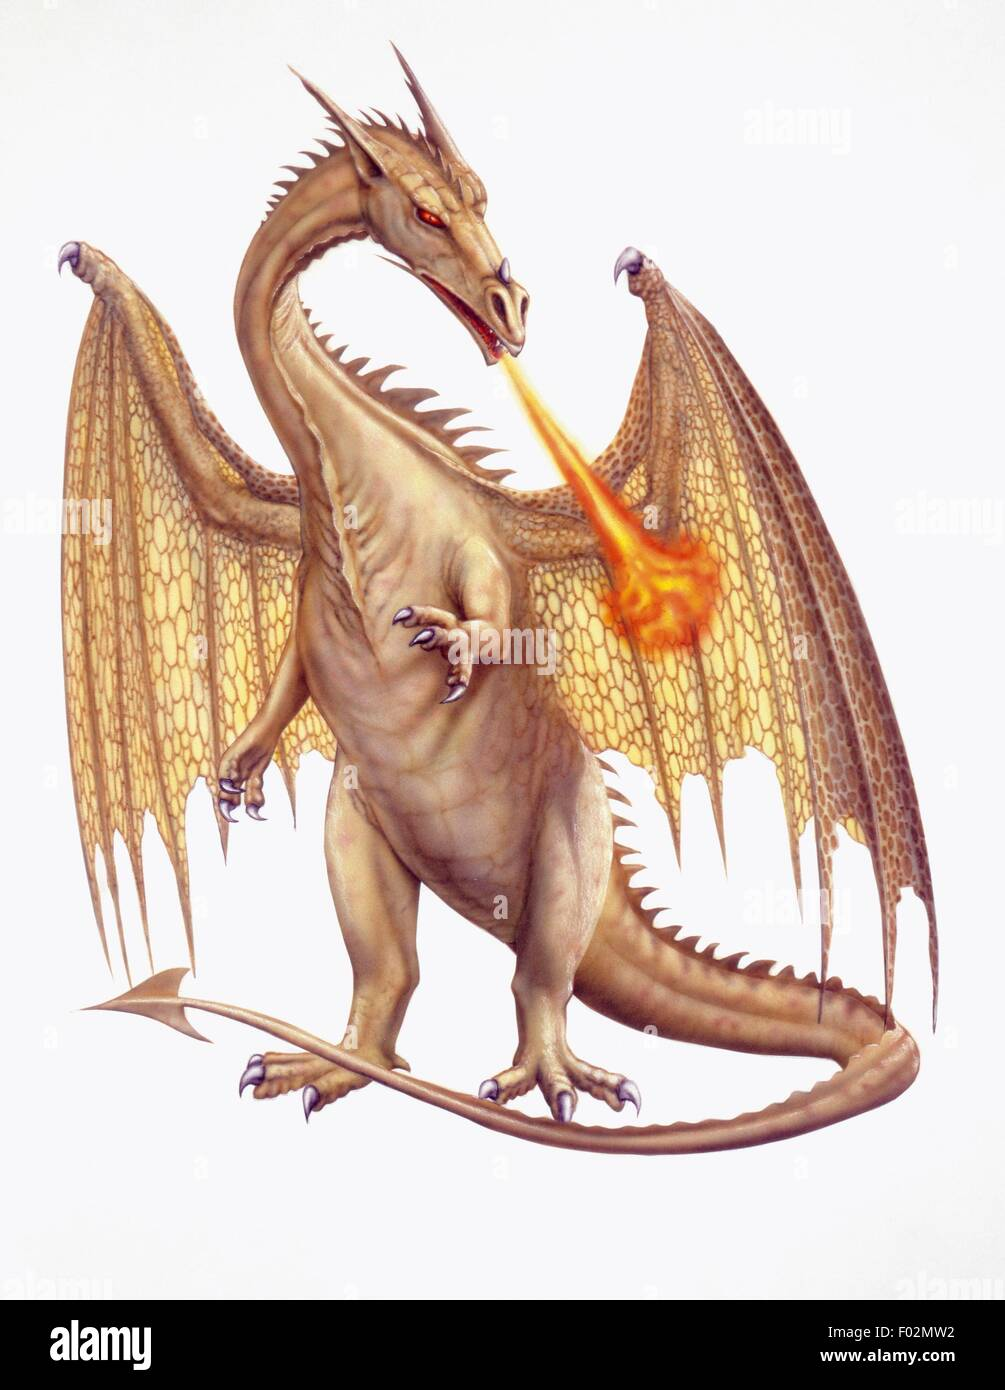 Dragon, animal fantastique. L'illustration. Photo Stock